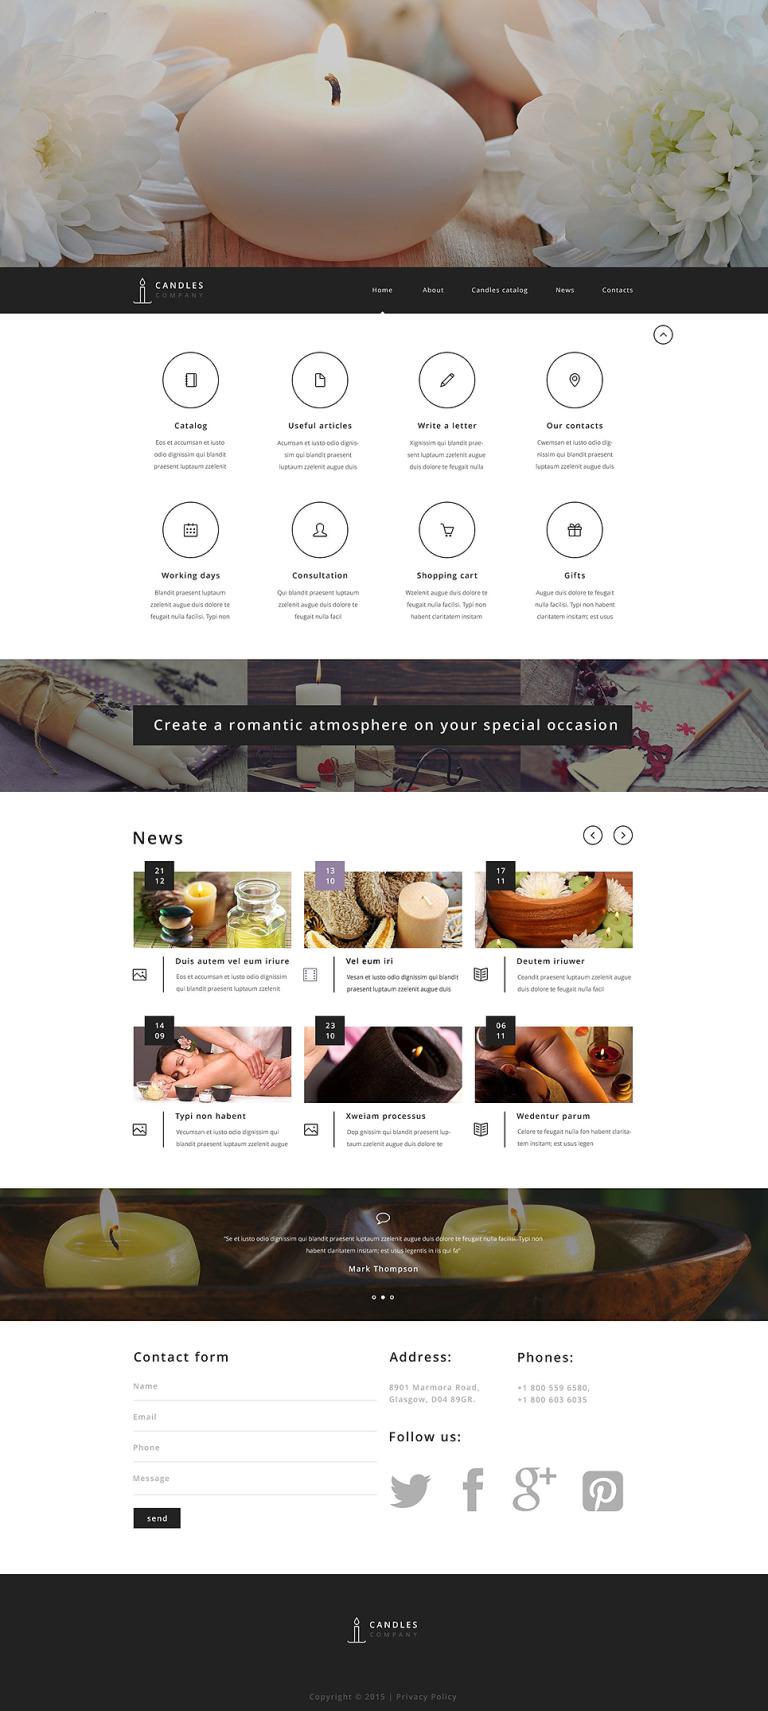 Candle Company Website Template New Screenshots BIG